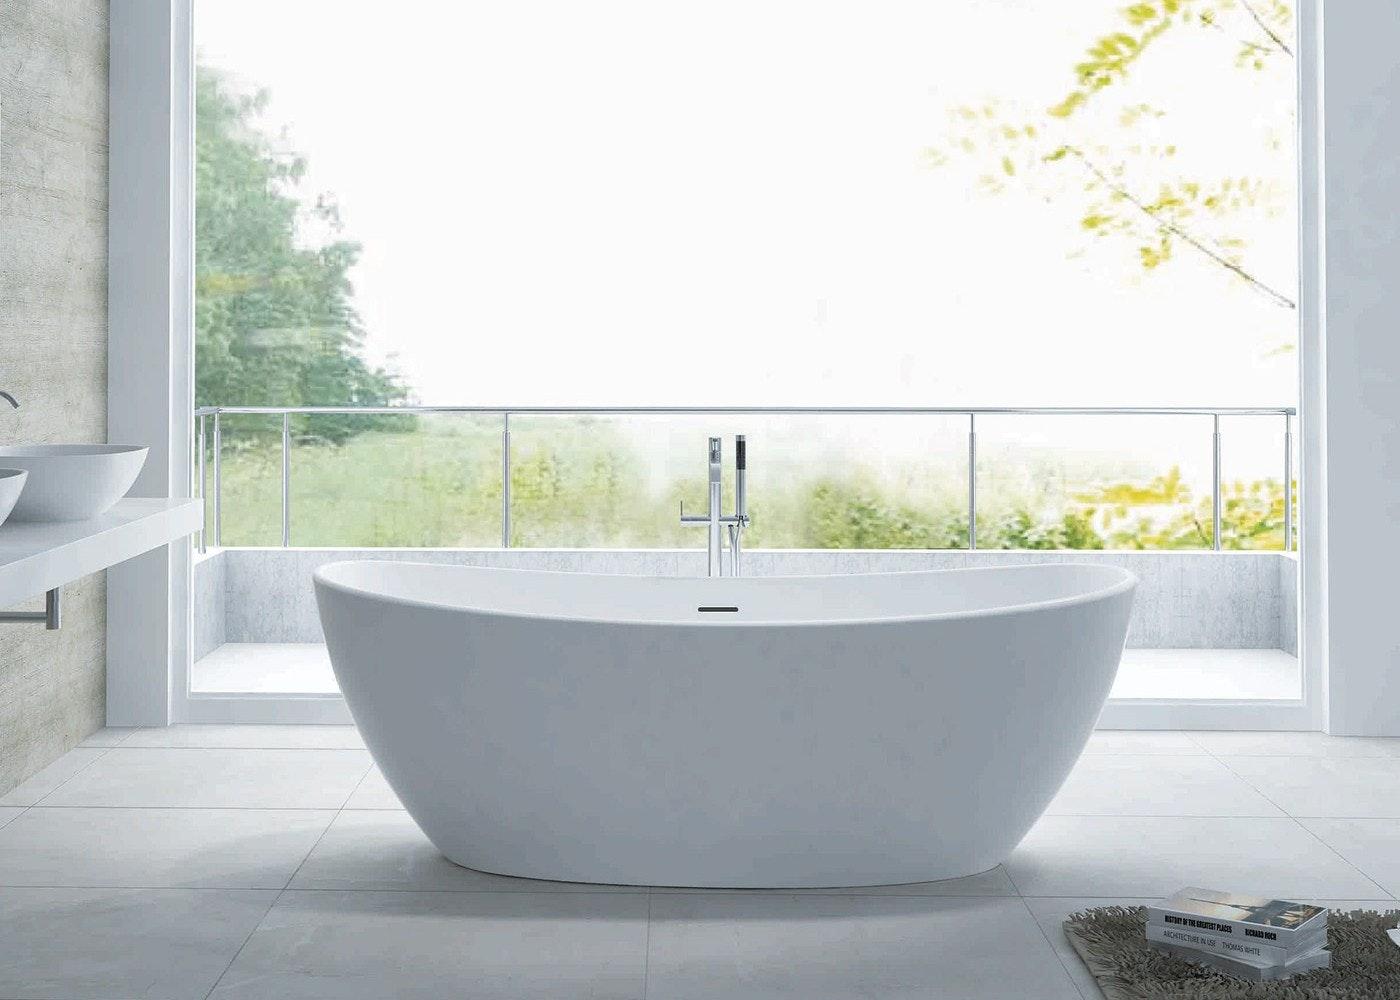 Pietra Bianca Maria Freestanding Bathtub | Freestanding Baths for ...